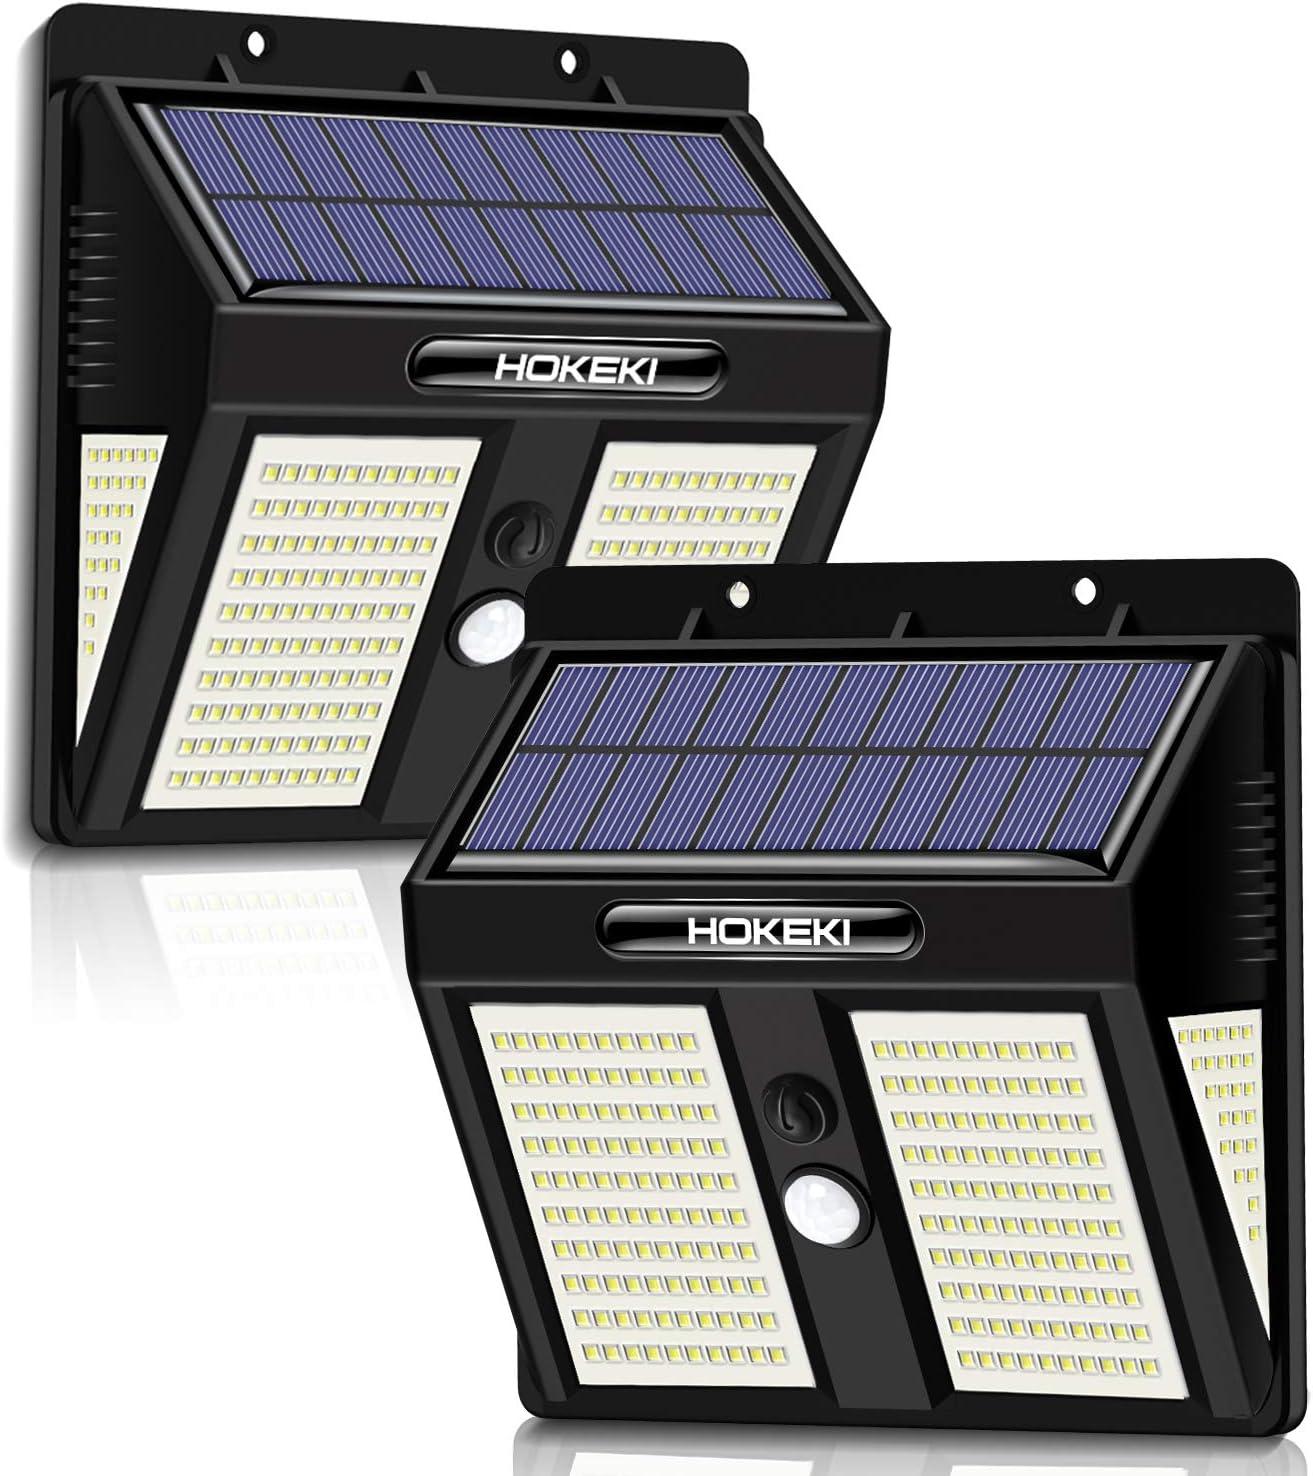 Solar Wall Light, 2pack,HOKEKI Motion Sensor Light,250 LEDs Outdoor Lighting Wireless Wall Light, 3 Adjustable Brightness, Waterproof Design, Easy-to-Install Security Lights for Front Door, Garage